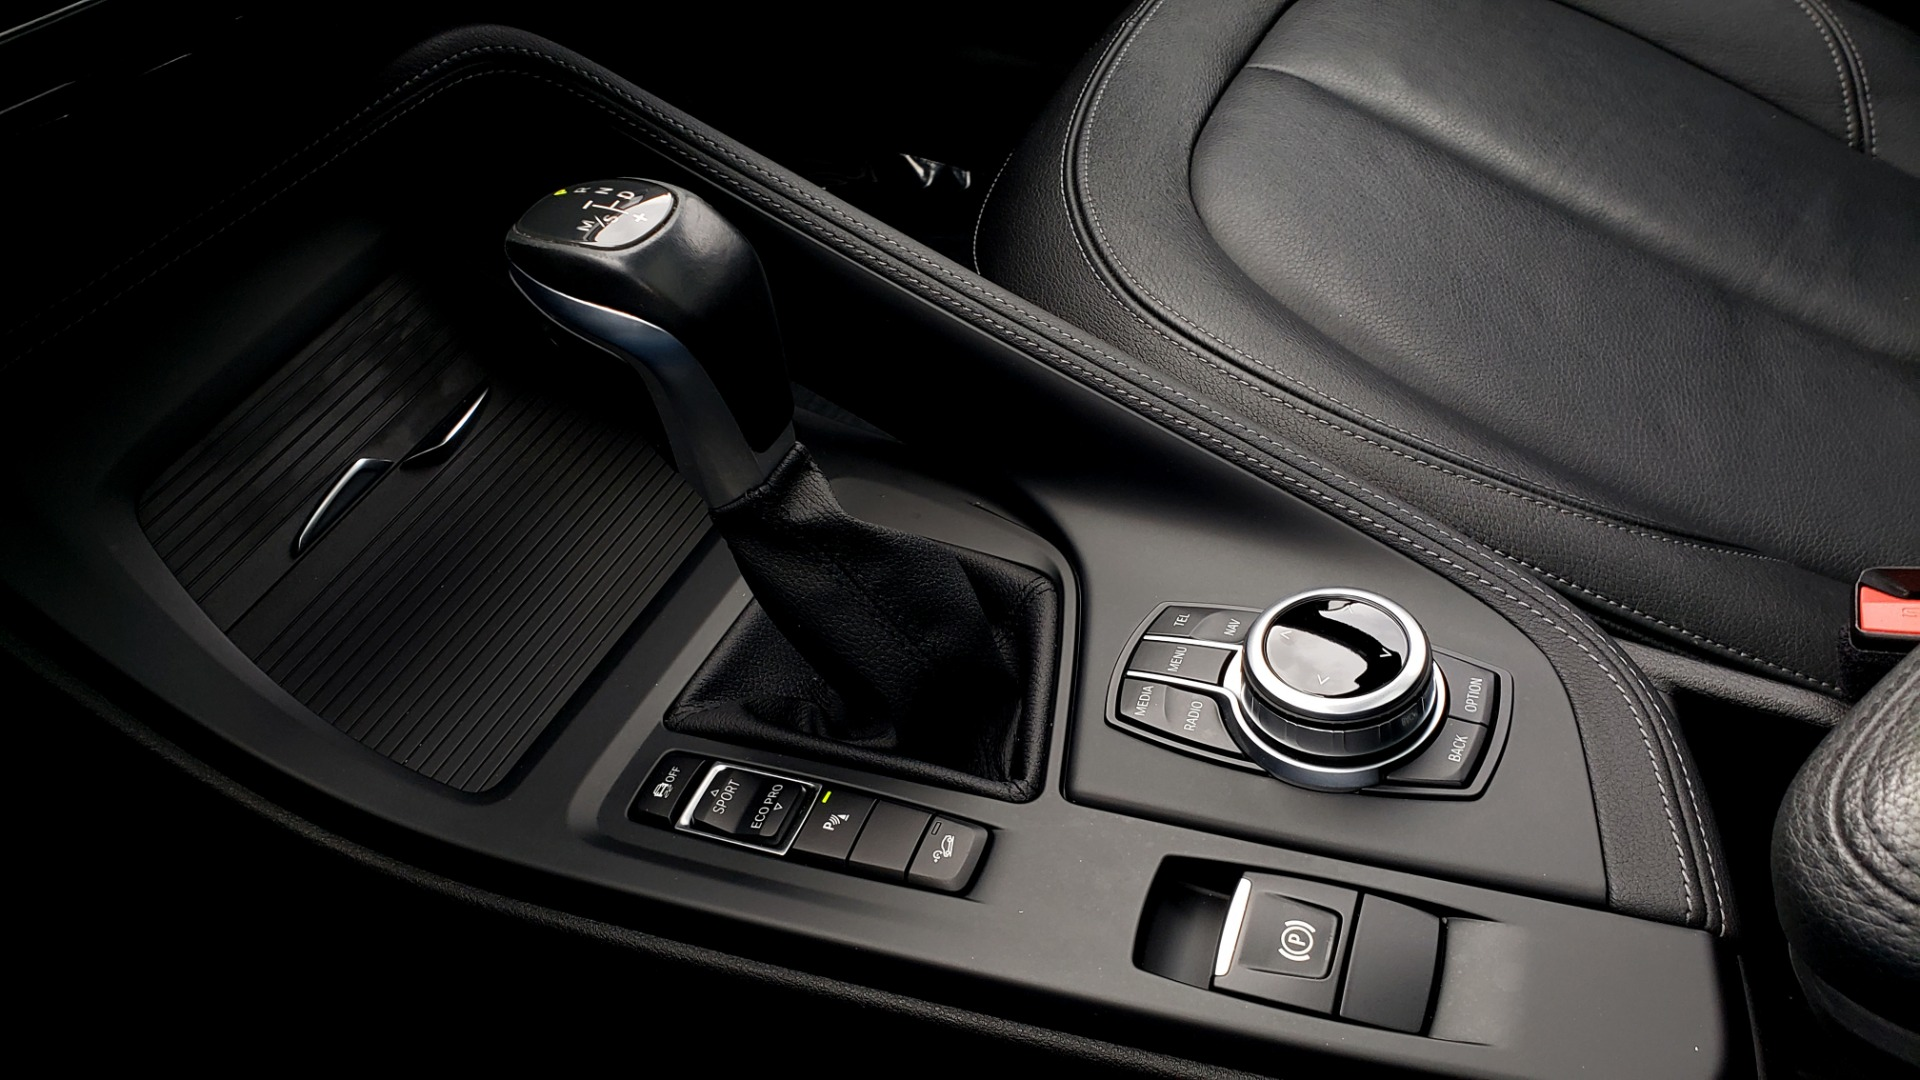 Used 2017 BMW X1 XDRIVE28I / PREM PKG / DRIVER ASST / NAV / CLD WTHR for sale Sold at Formula Imports in Charlotte NC 28227 51